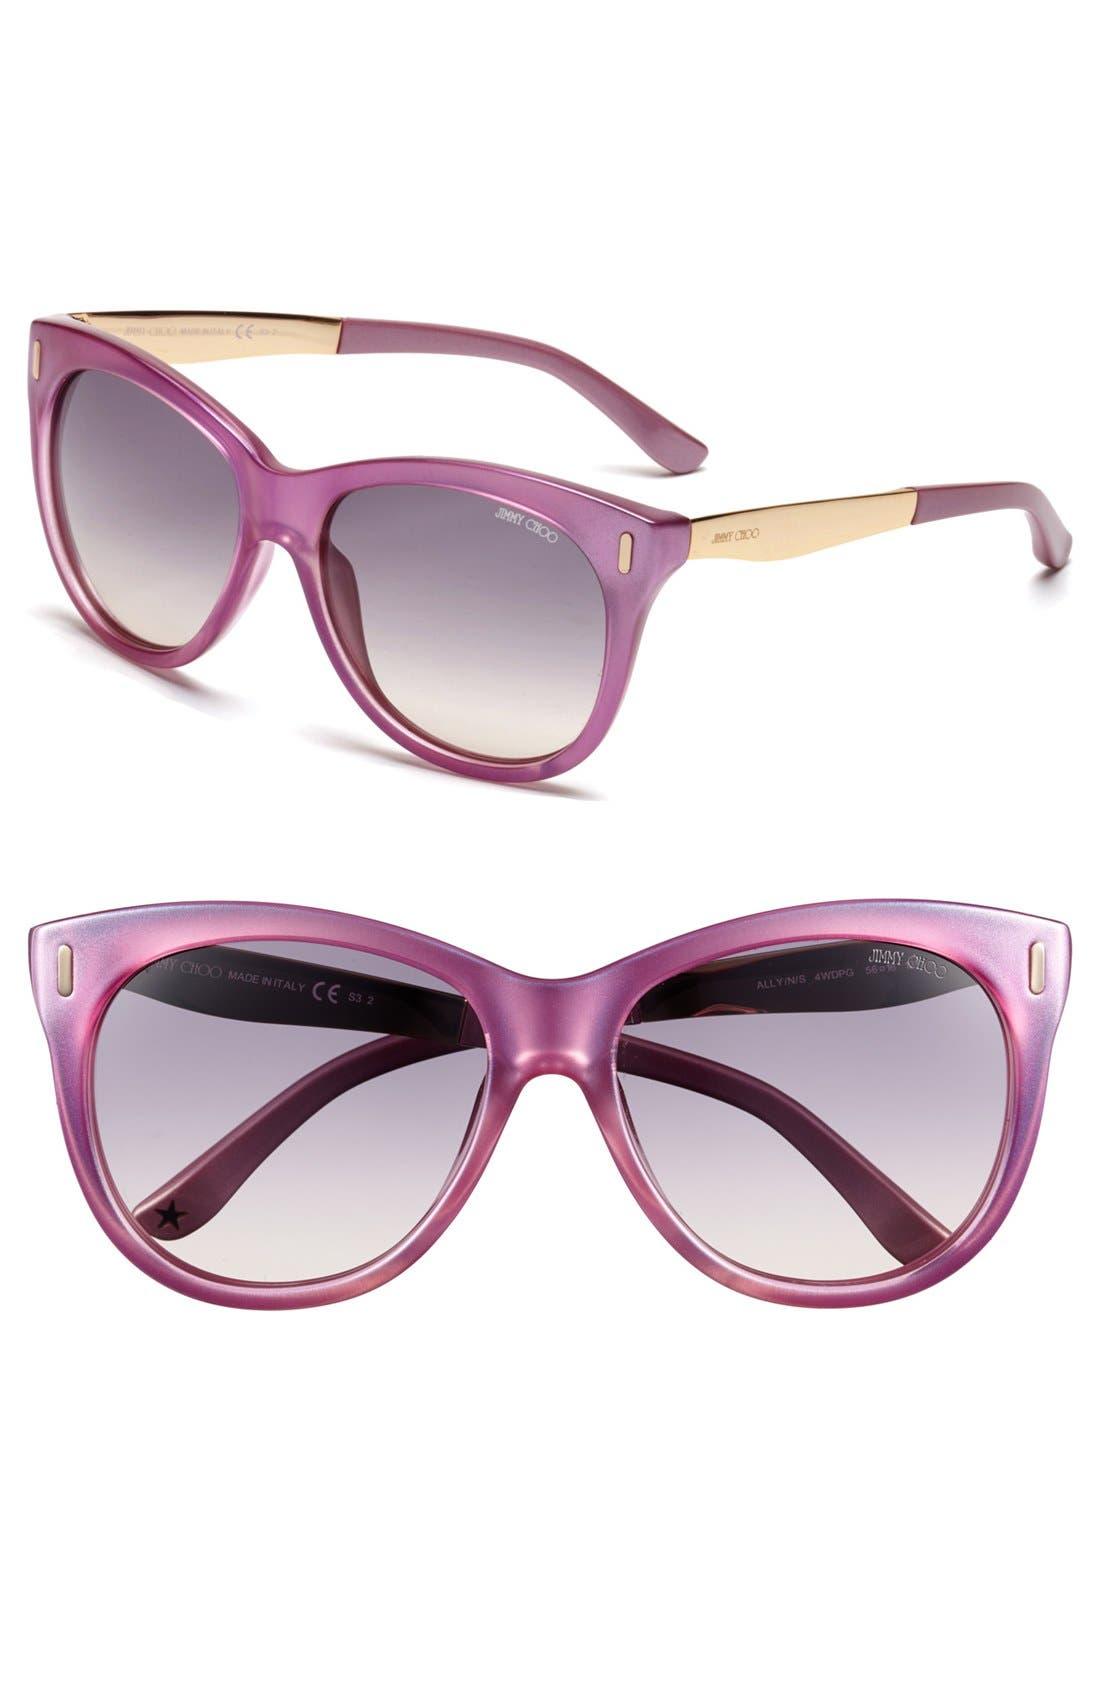 Main Image - Jimmy Choo 56mm Retro Sunglasses